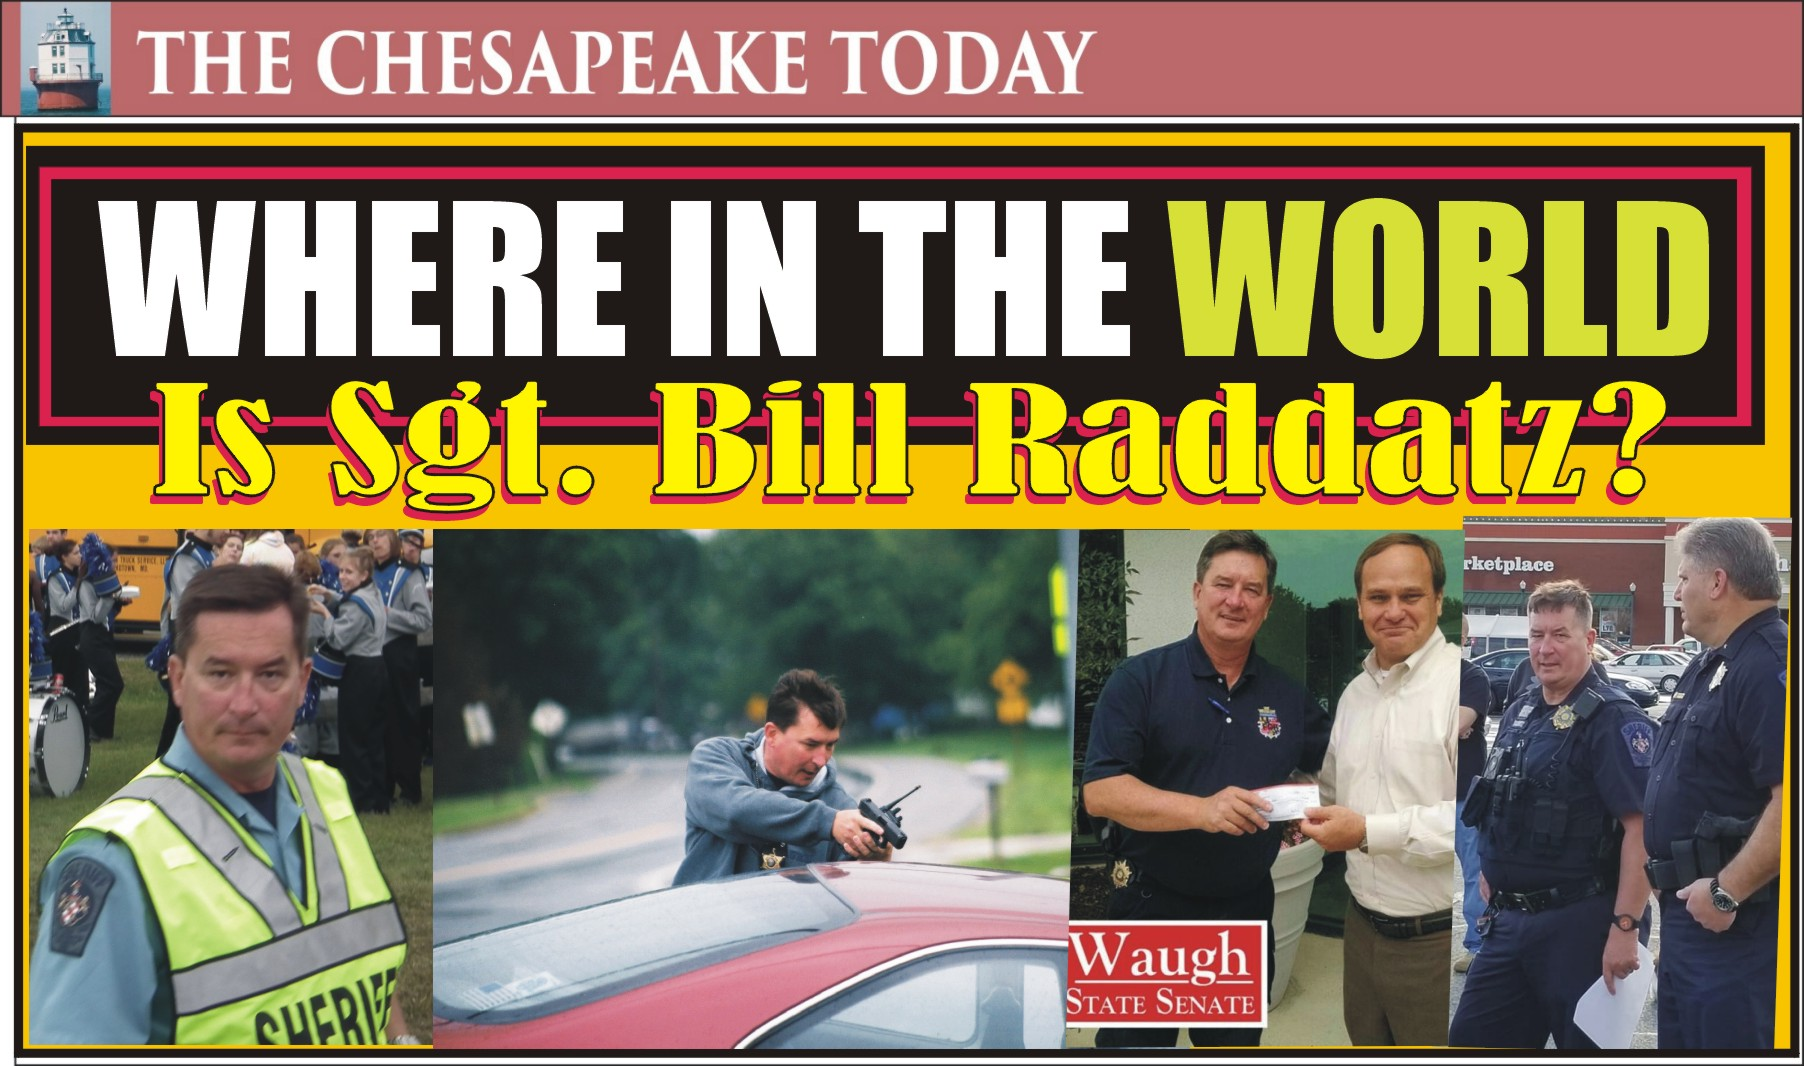 VIDEO SHORT: Where in the World is Sgt. Bill Raddatz?